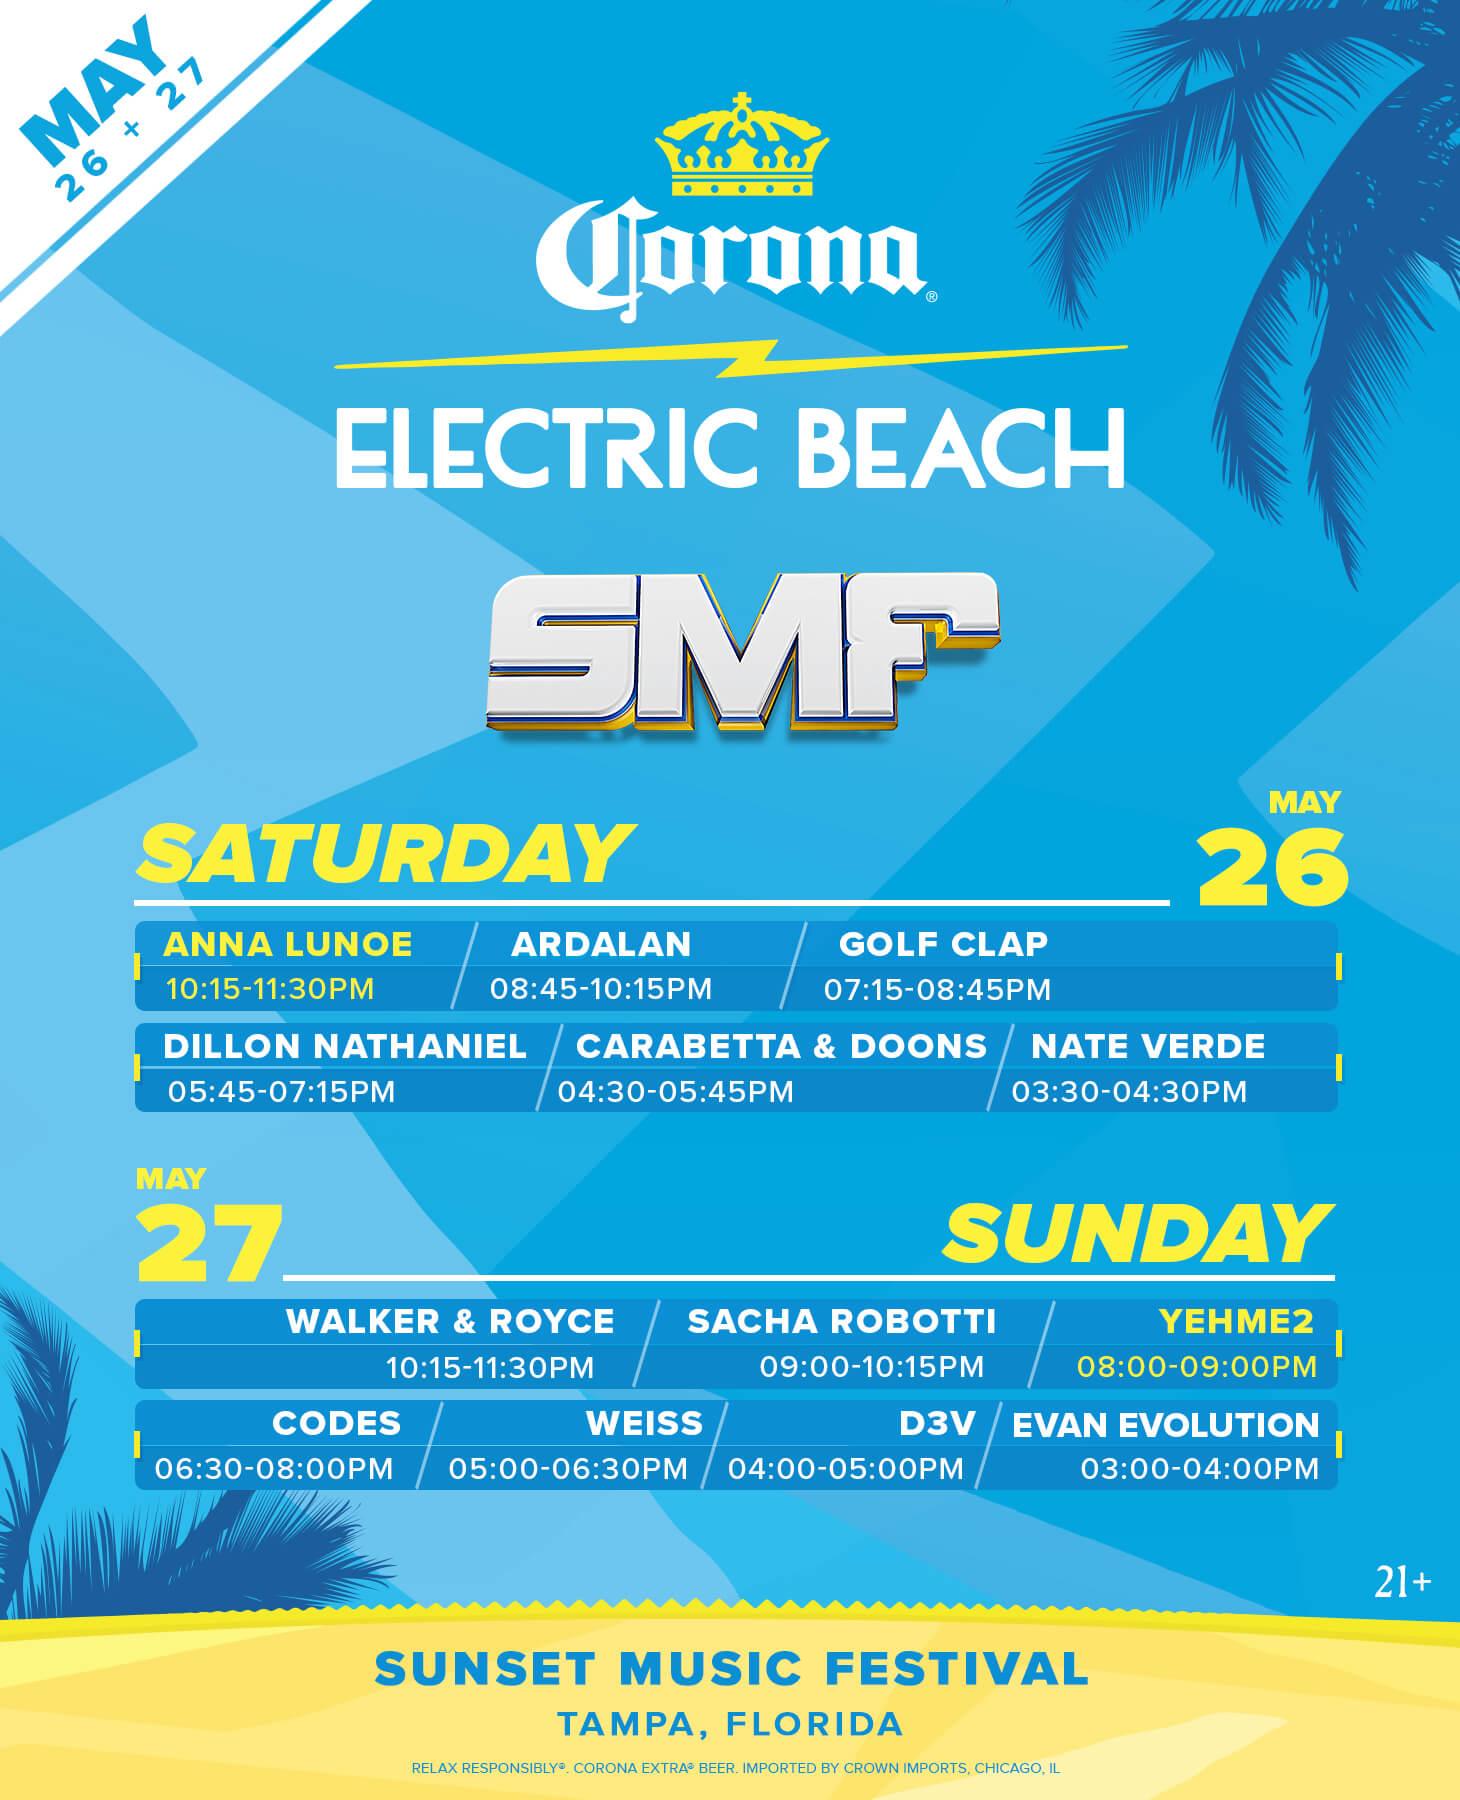 Corona Stage Lineup Poster